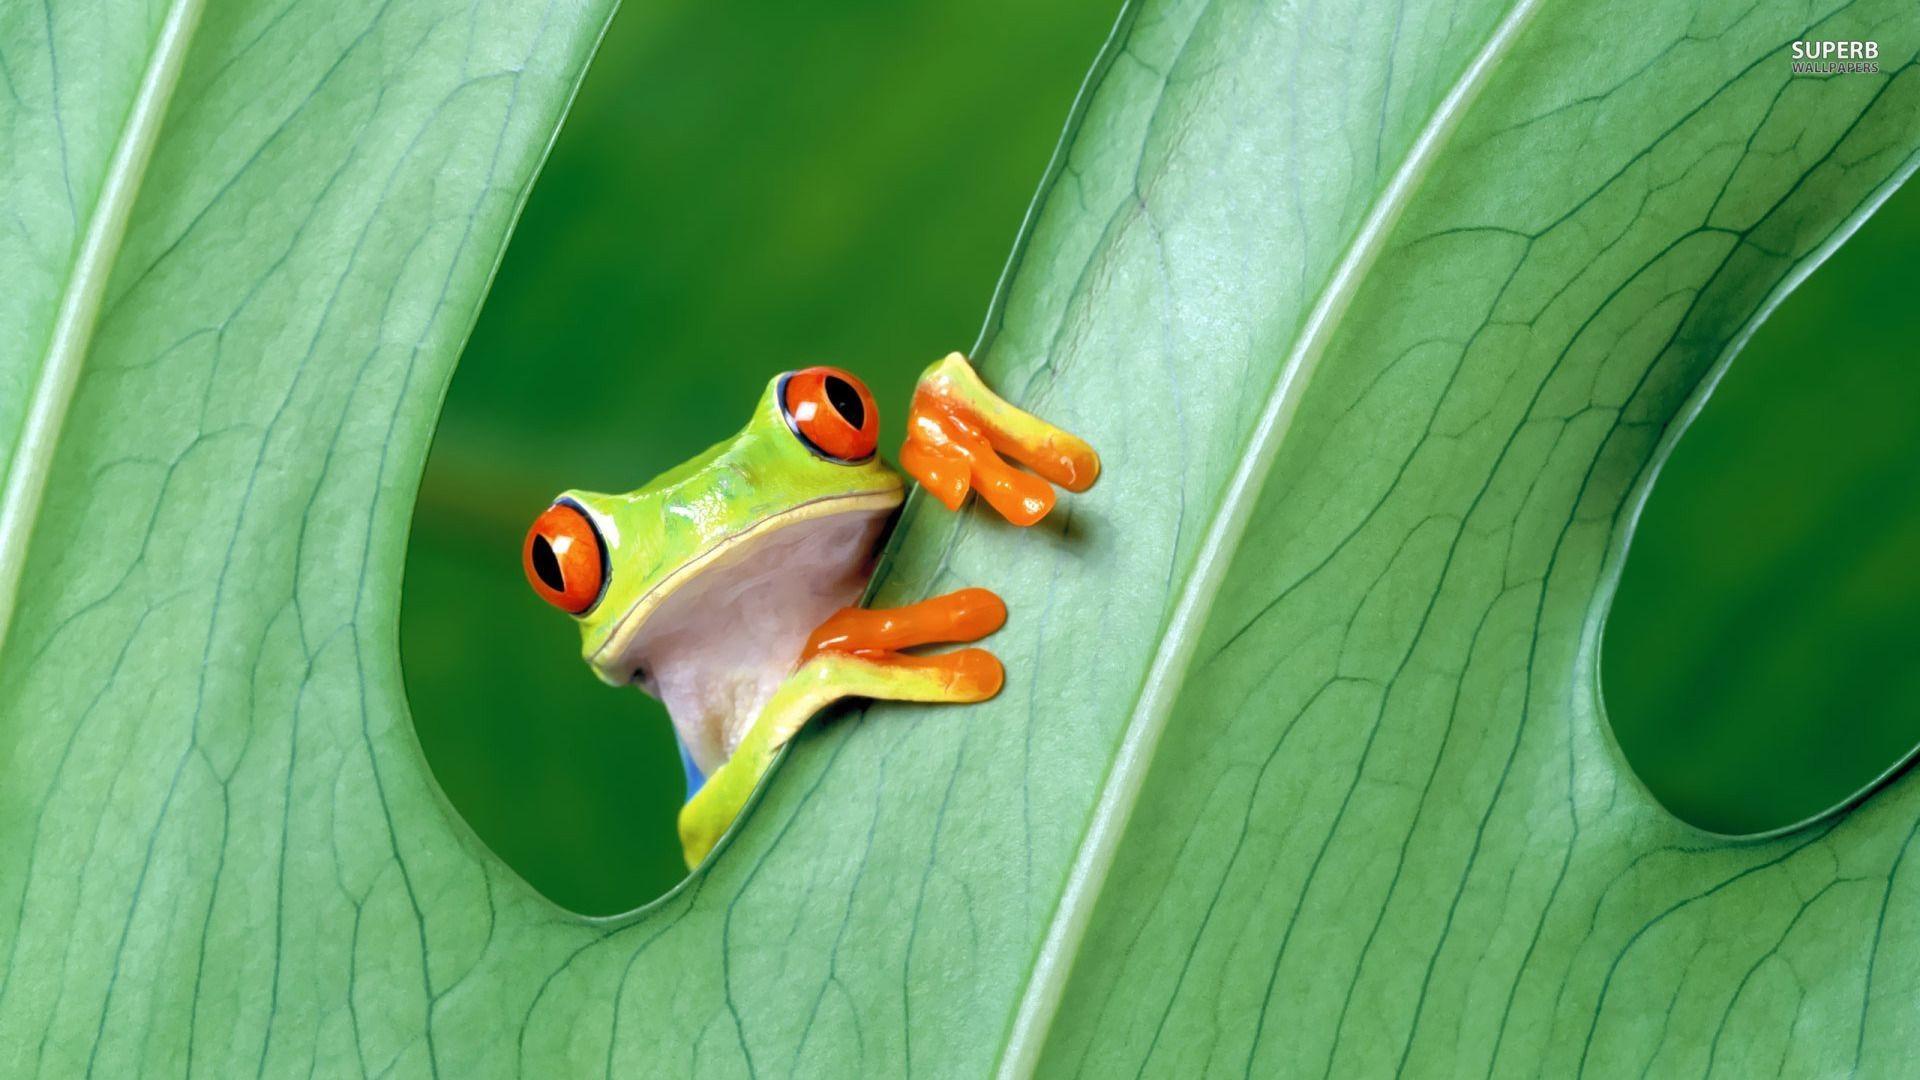 PC Frog Wallpapers, Anatoli Berger. 0.188 MB. Frog Wallpaper